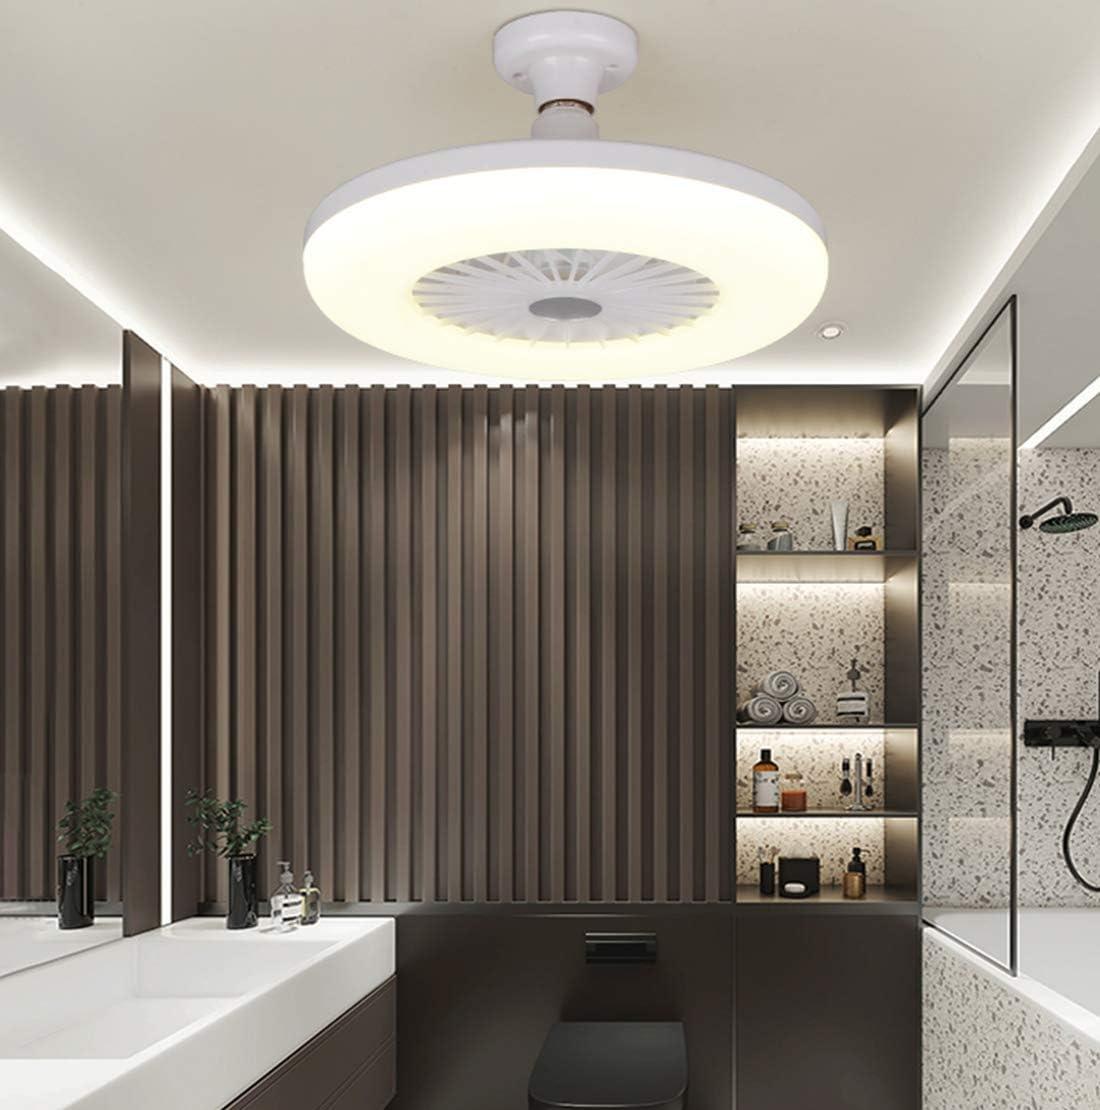 Luz de Techo LED para Ventilador, Dormitorio Moderno y Creativo de 30 cm Ventilador Silencioso invisible Hogar E27 Lámpara Ventilador de Cabeza Luz Para Dormitorio Sala de Estar Comedor